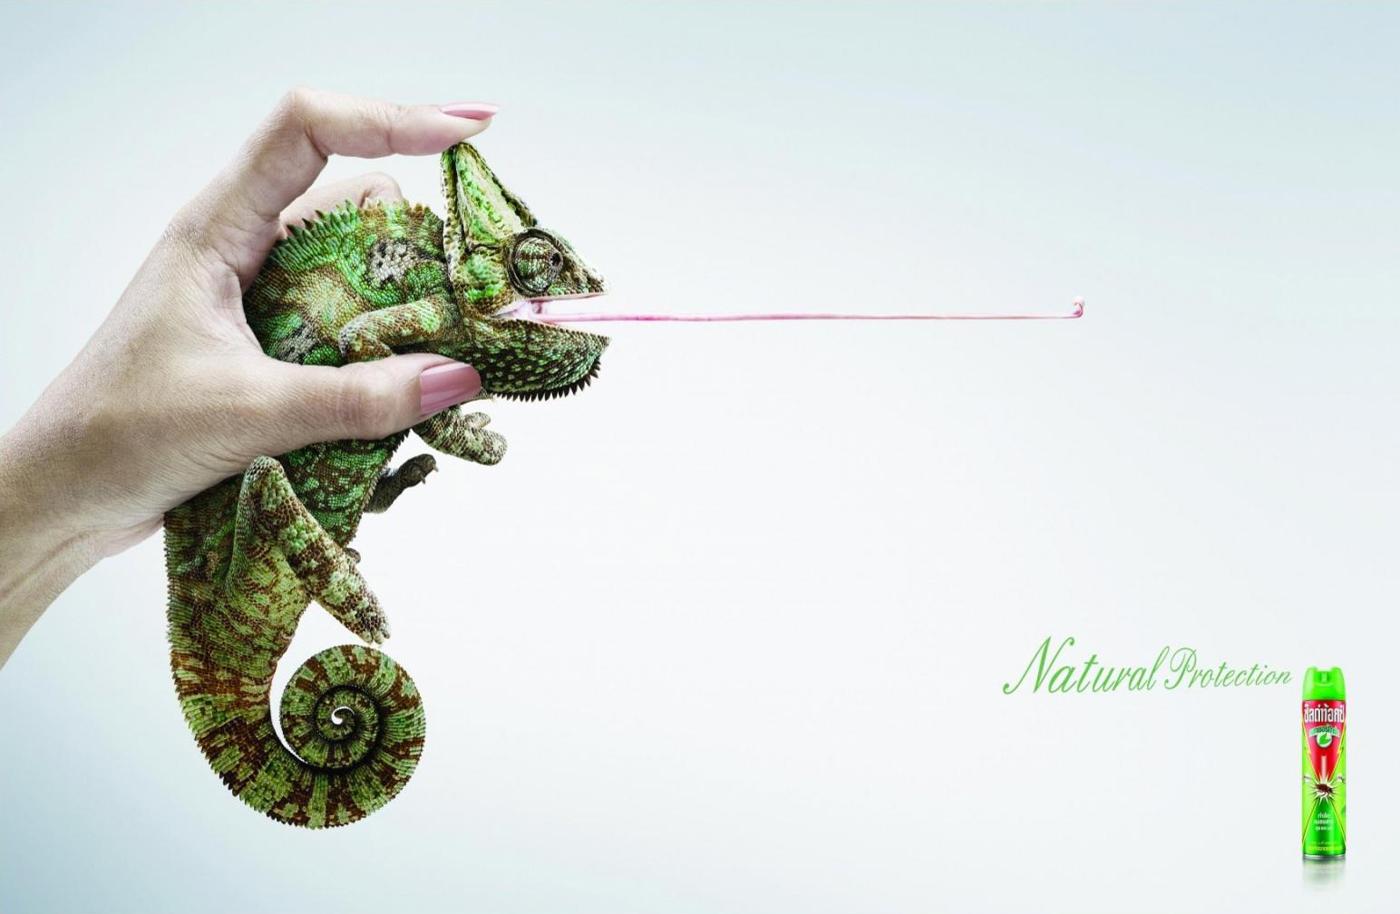 advertising templates brand manager guide advertising templates absurd alternative shieldtox naturgard chameleon